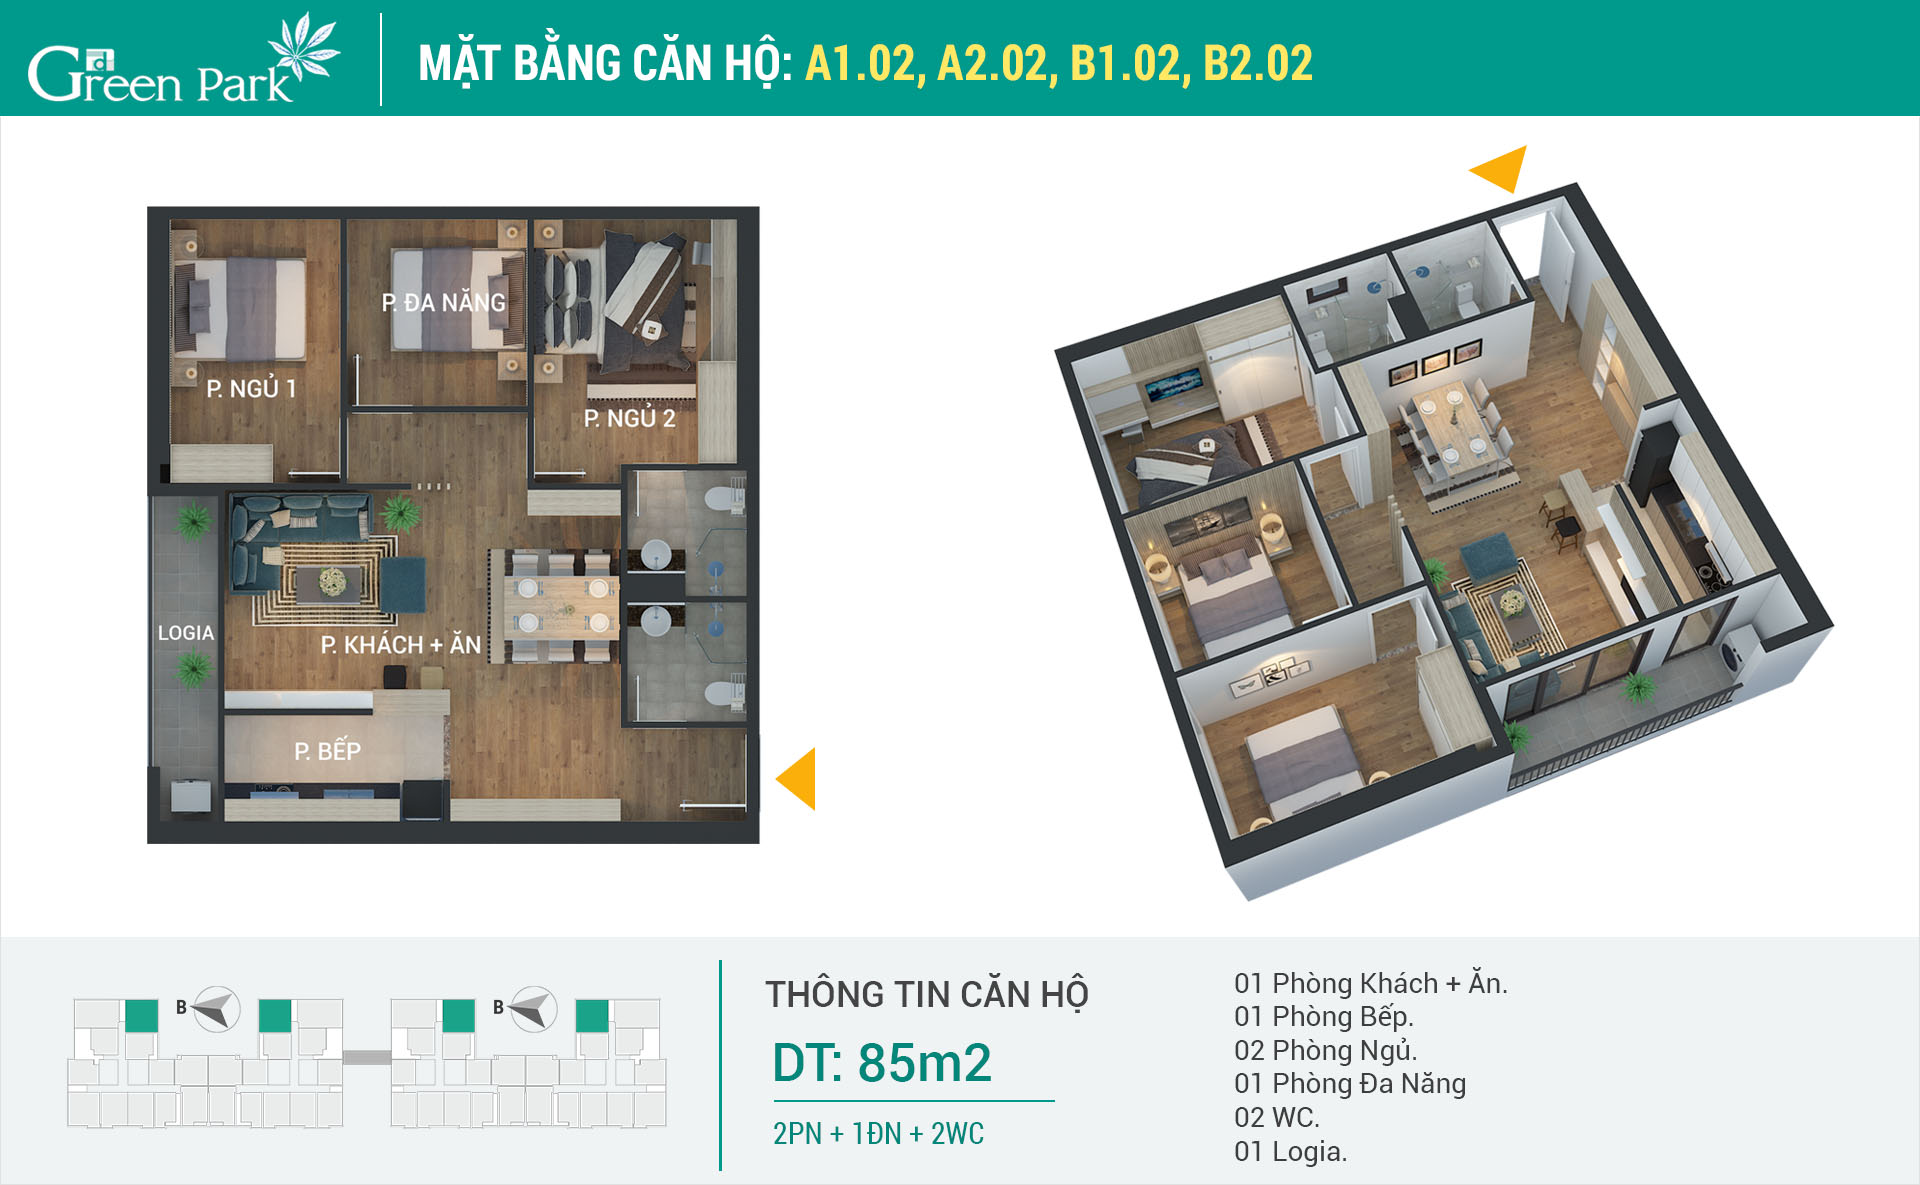 Mặt bằng căn hộ A1-02, A2-02, B1-02, B2-02